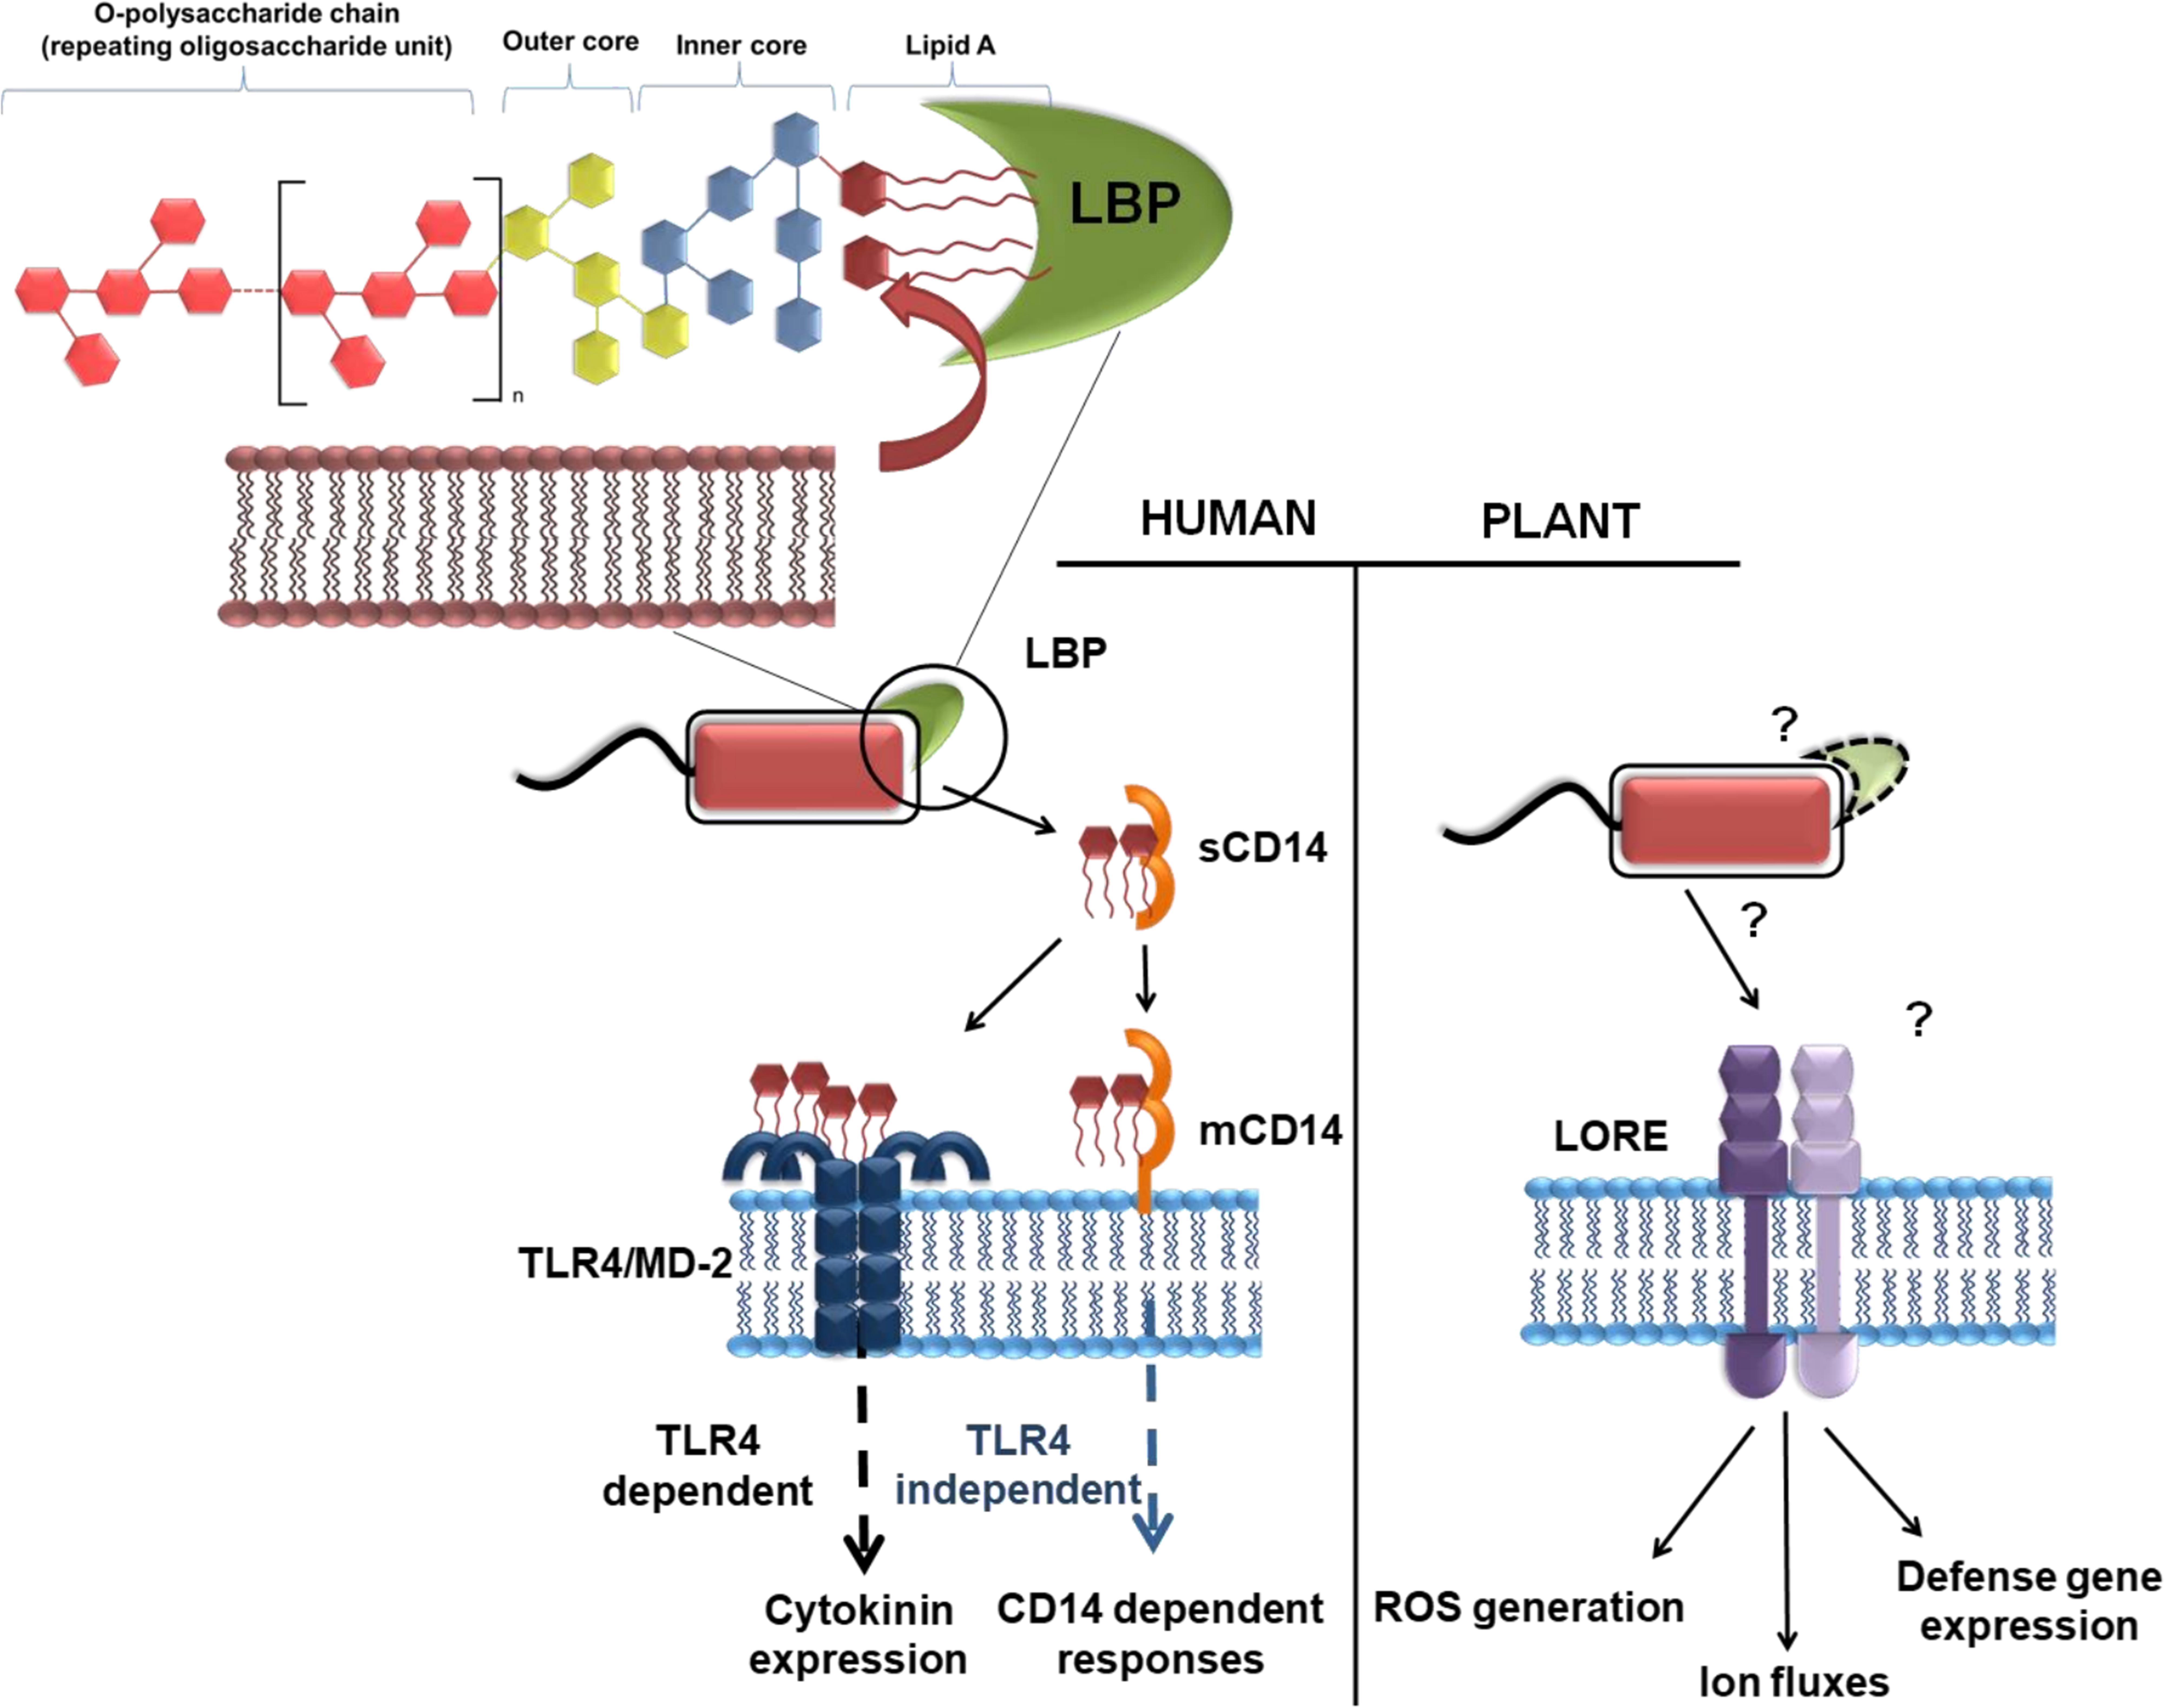 Frontiers | Glycans as Modulators of Plant Defense Against